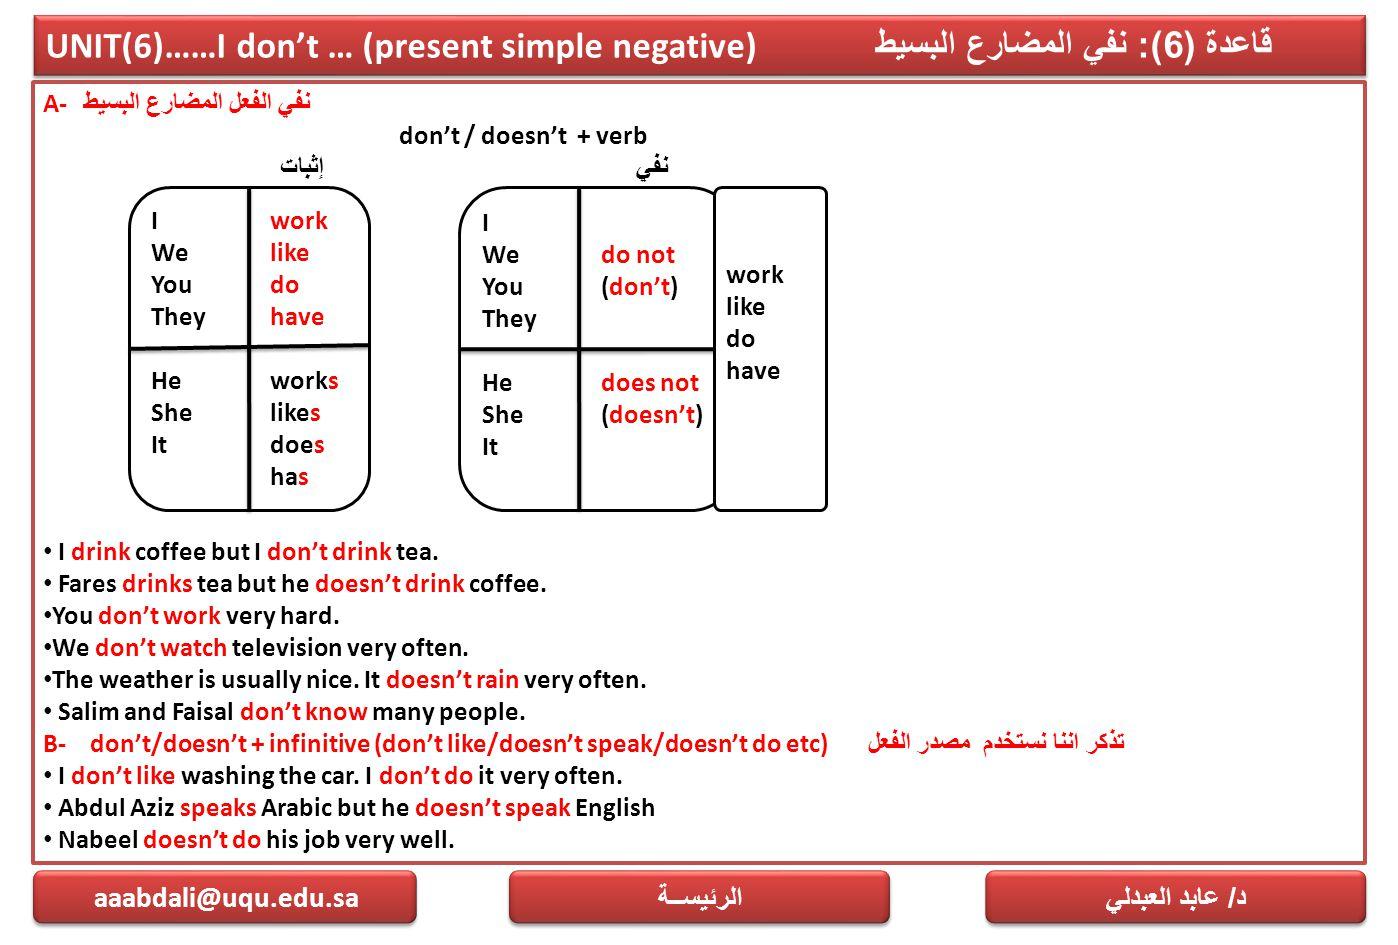 UNIT(6)……I don't … (present simple negative) قاعدة (6): نفي المضارع البسيط A- نفي الفعل المضارع البسيط don't / doesn't + verb إثباتنفي I drink coffee